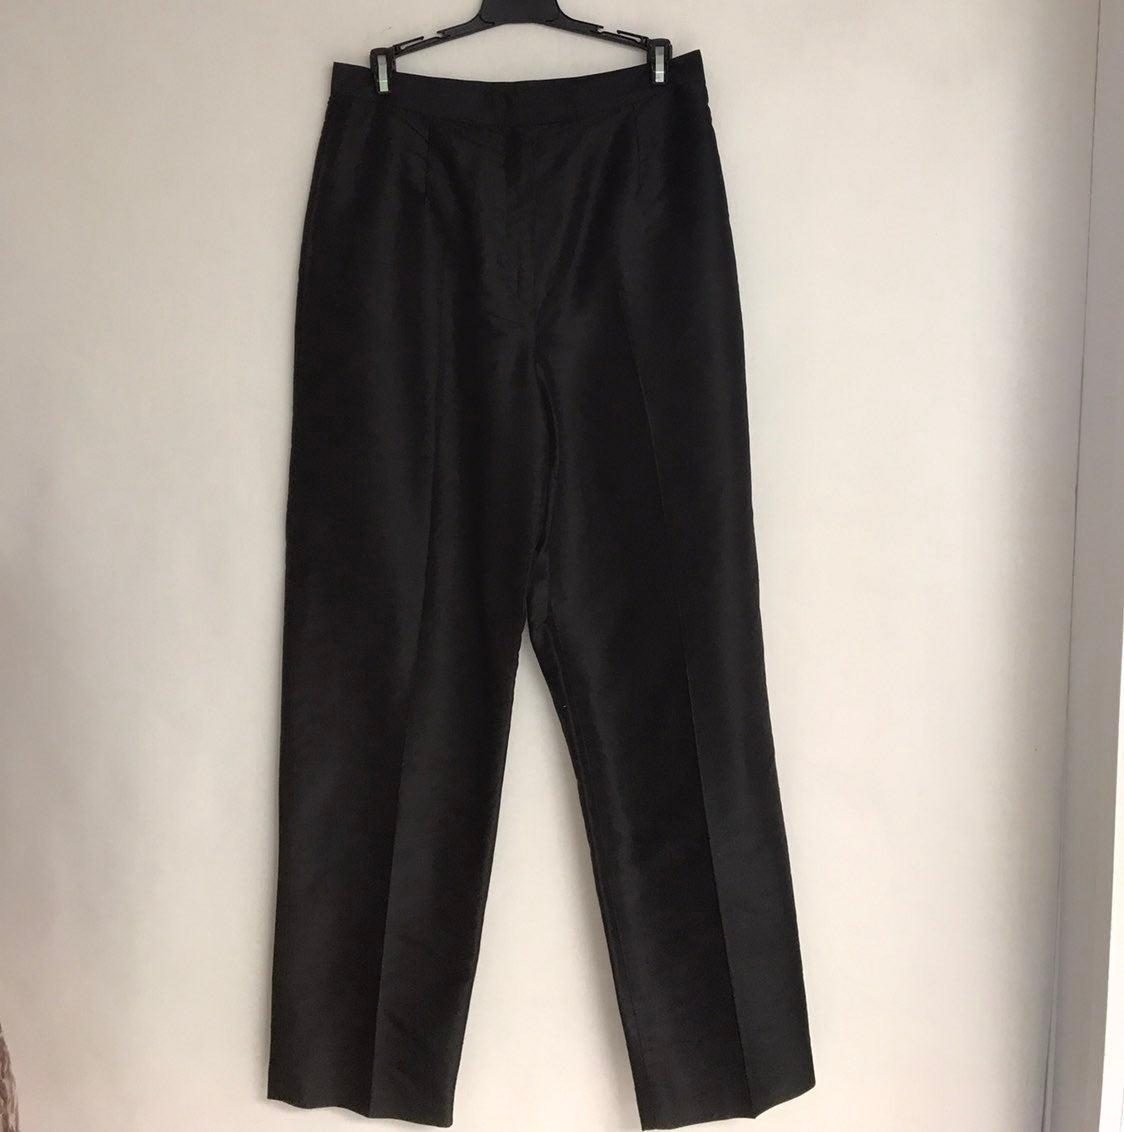 Rafaella Silk Black Pants NWOT